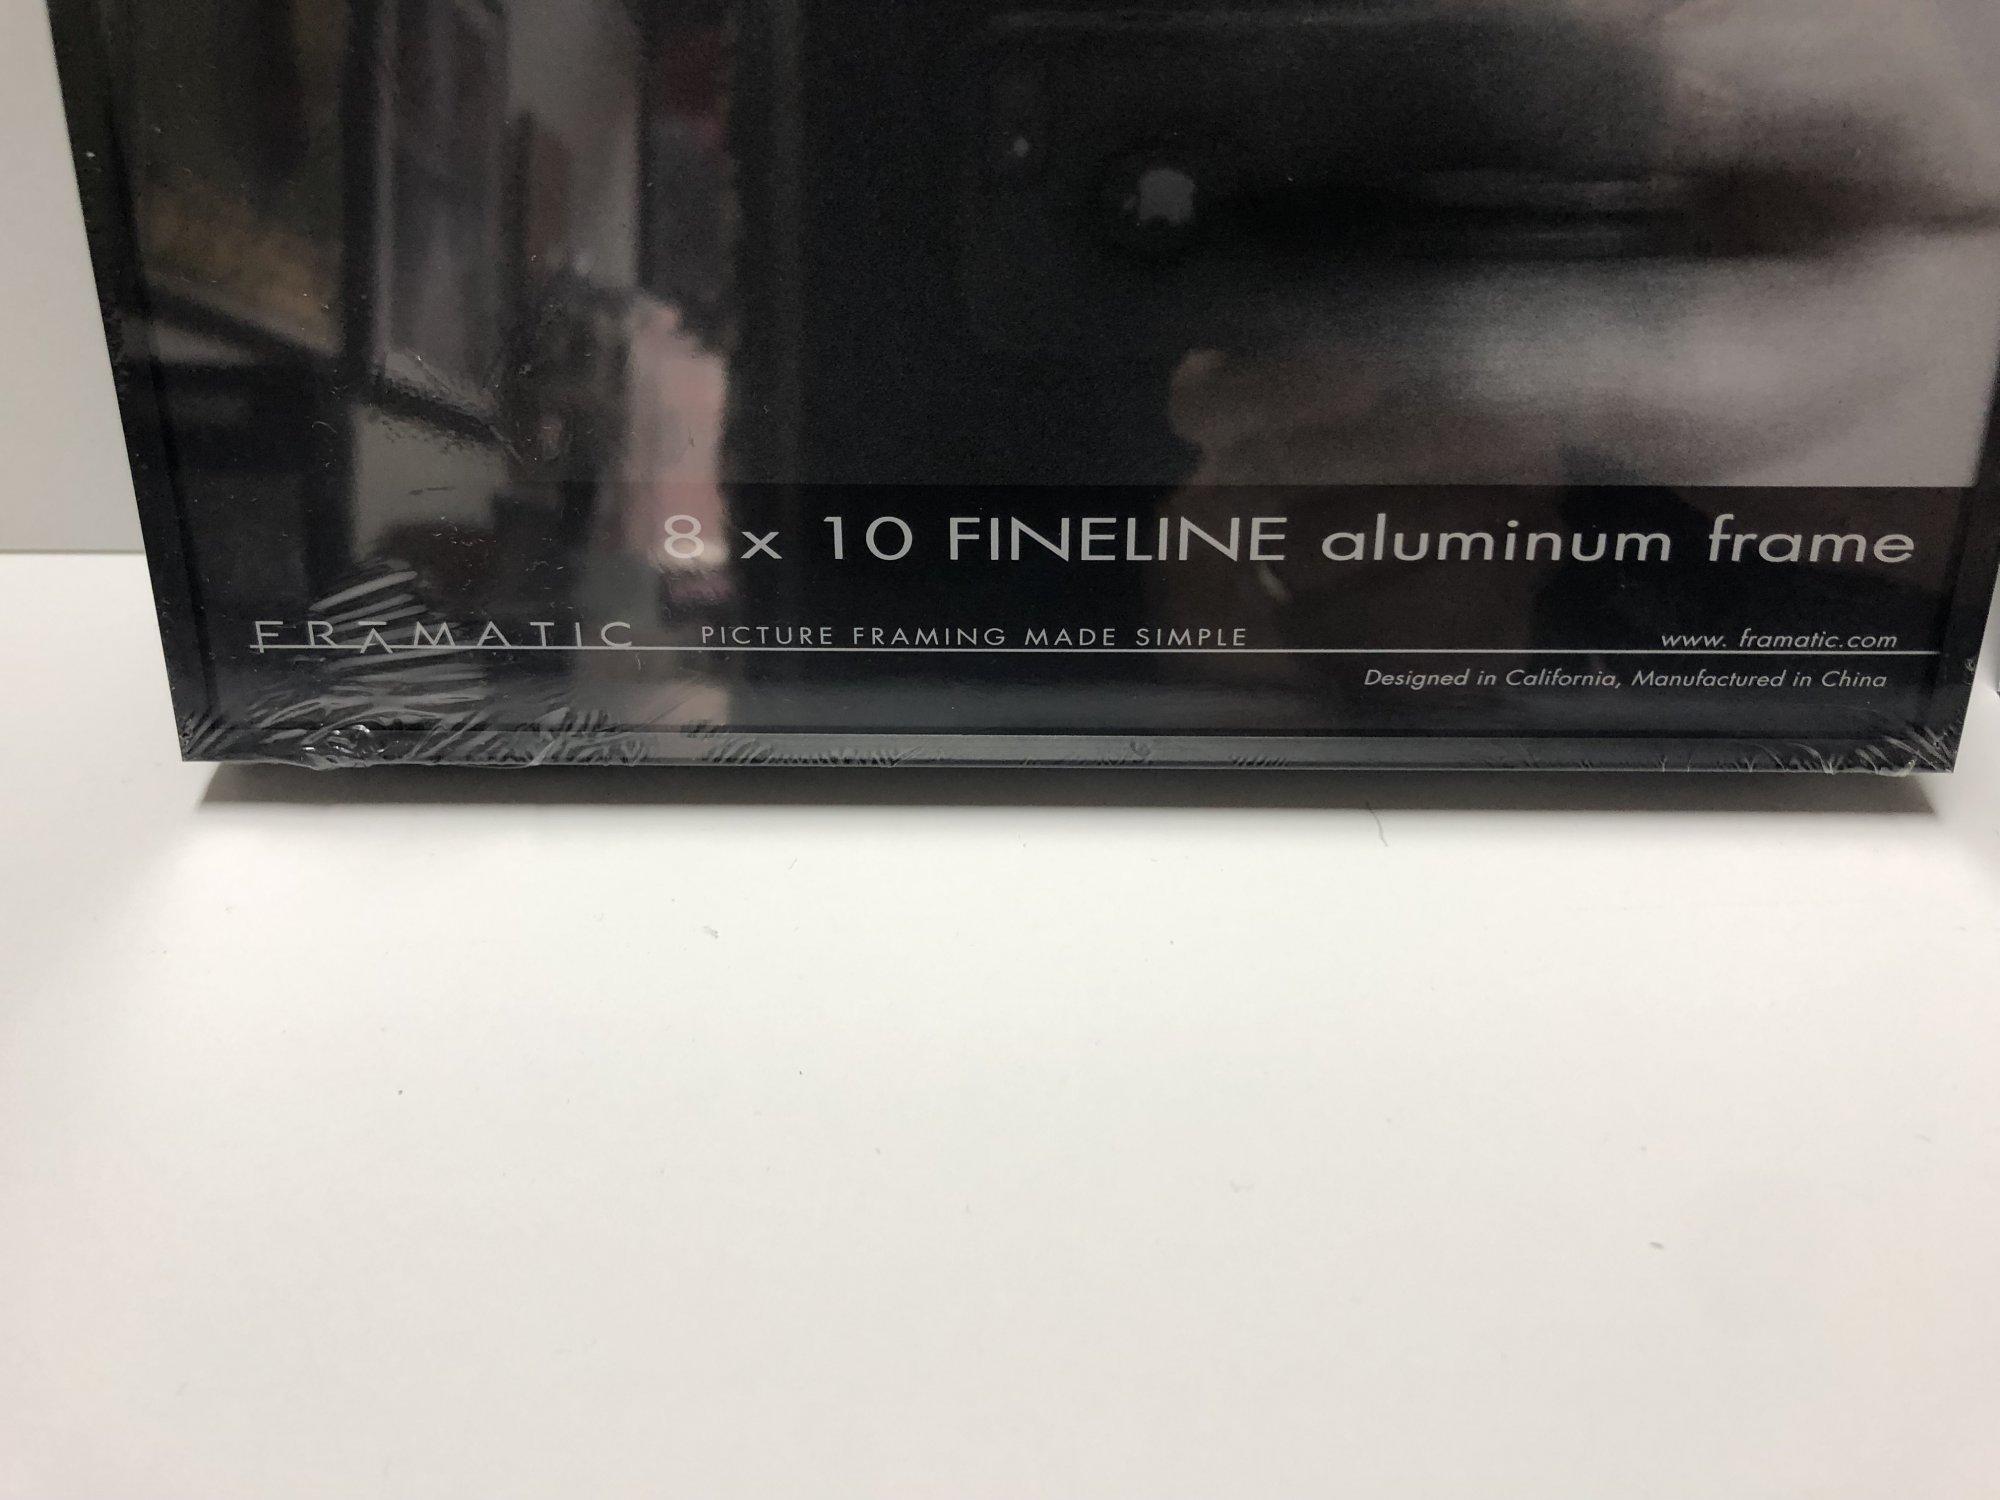 Framatic Fineline 8 x 10 Metal Readymade Frame